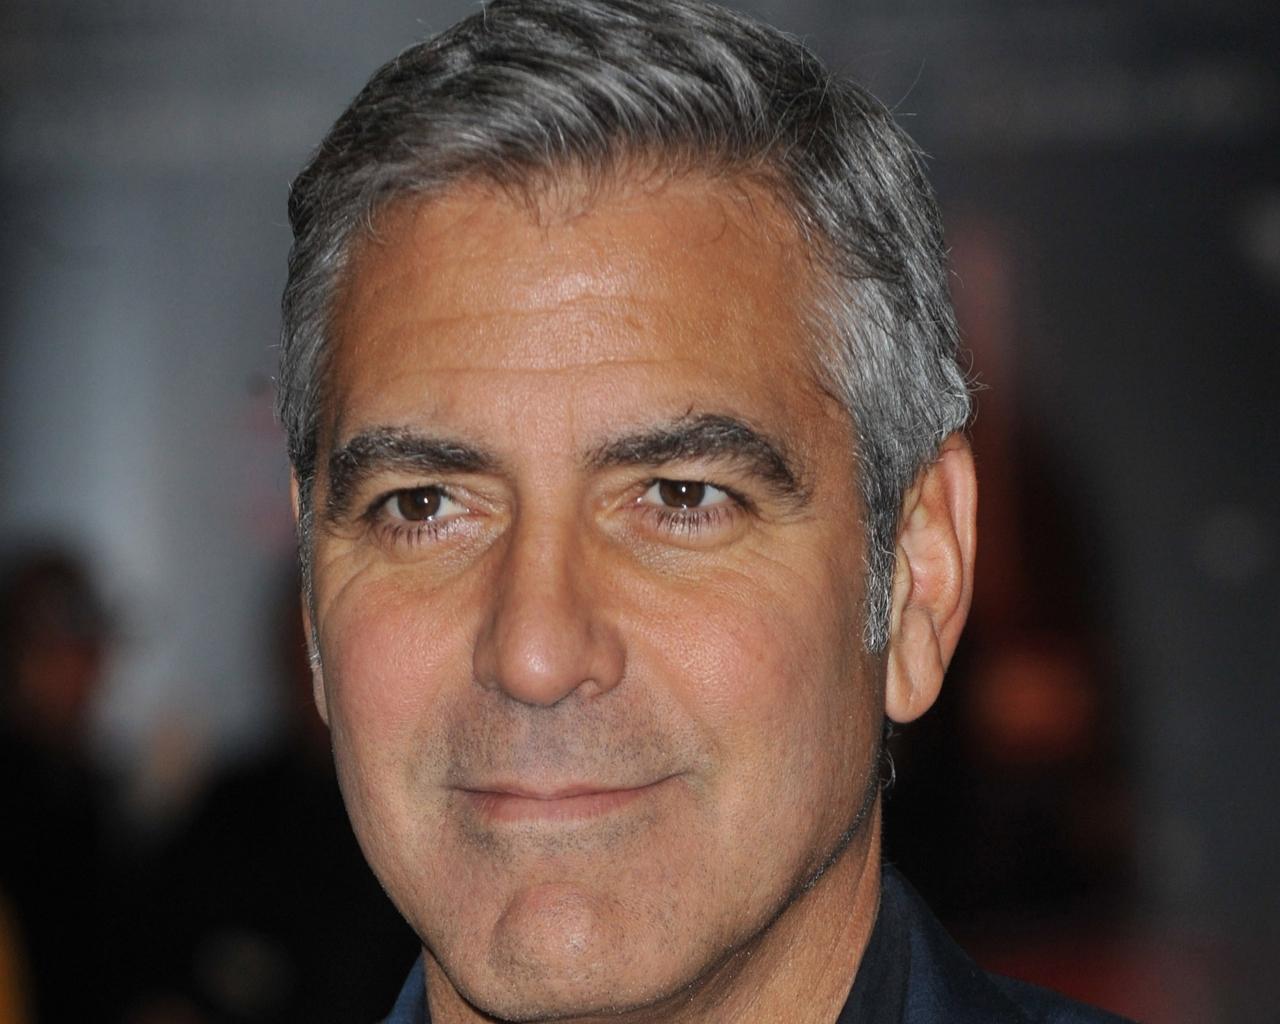 George Clooney - George-Clooney-george-clooney-28761400-1280-1024